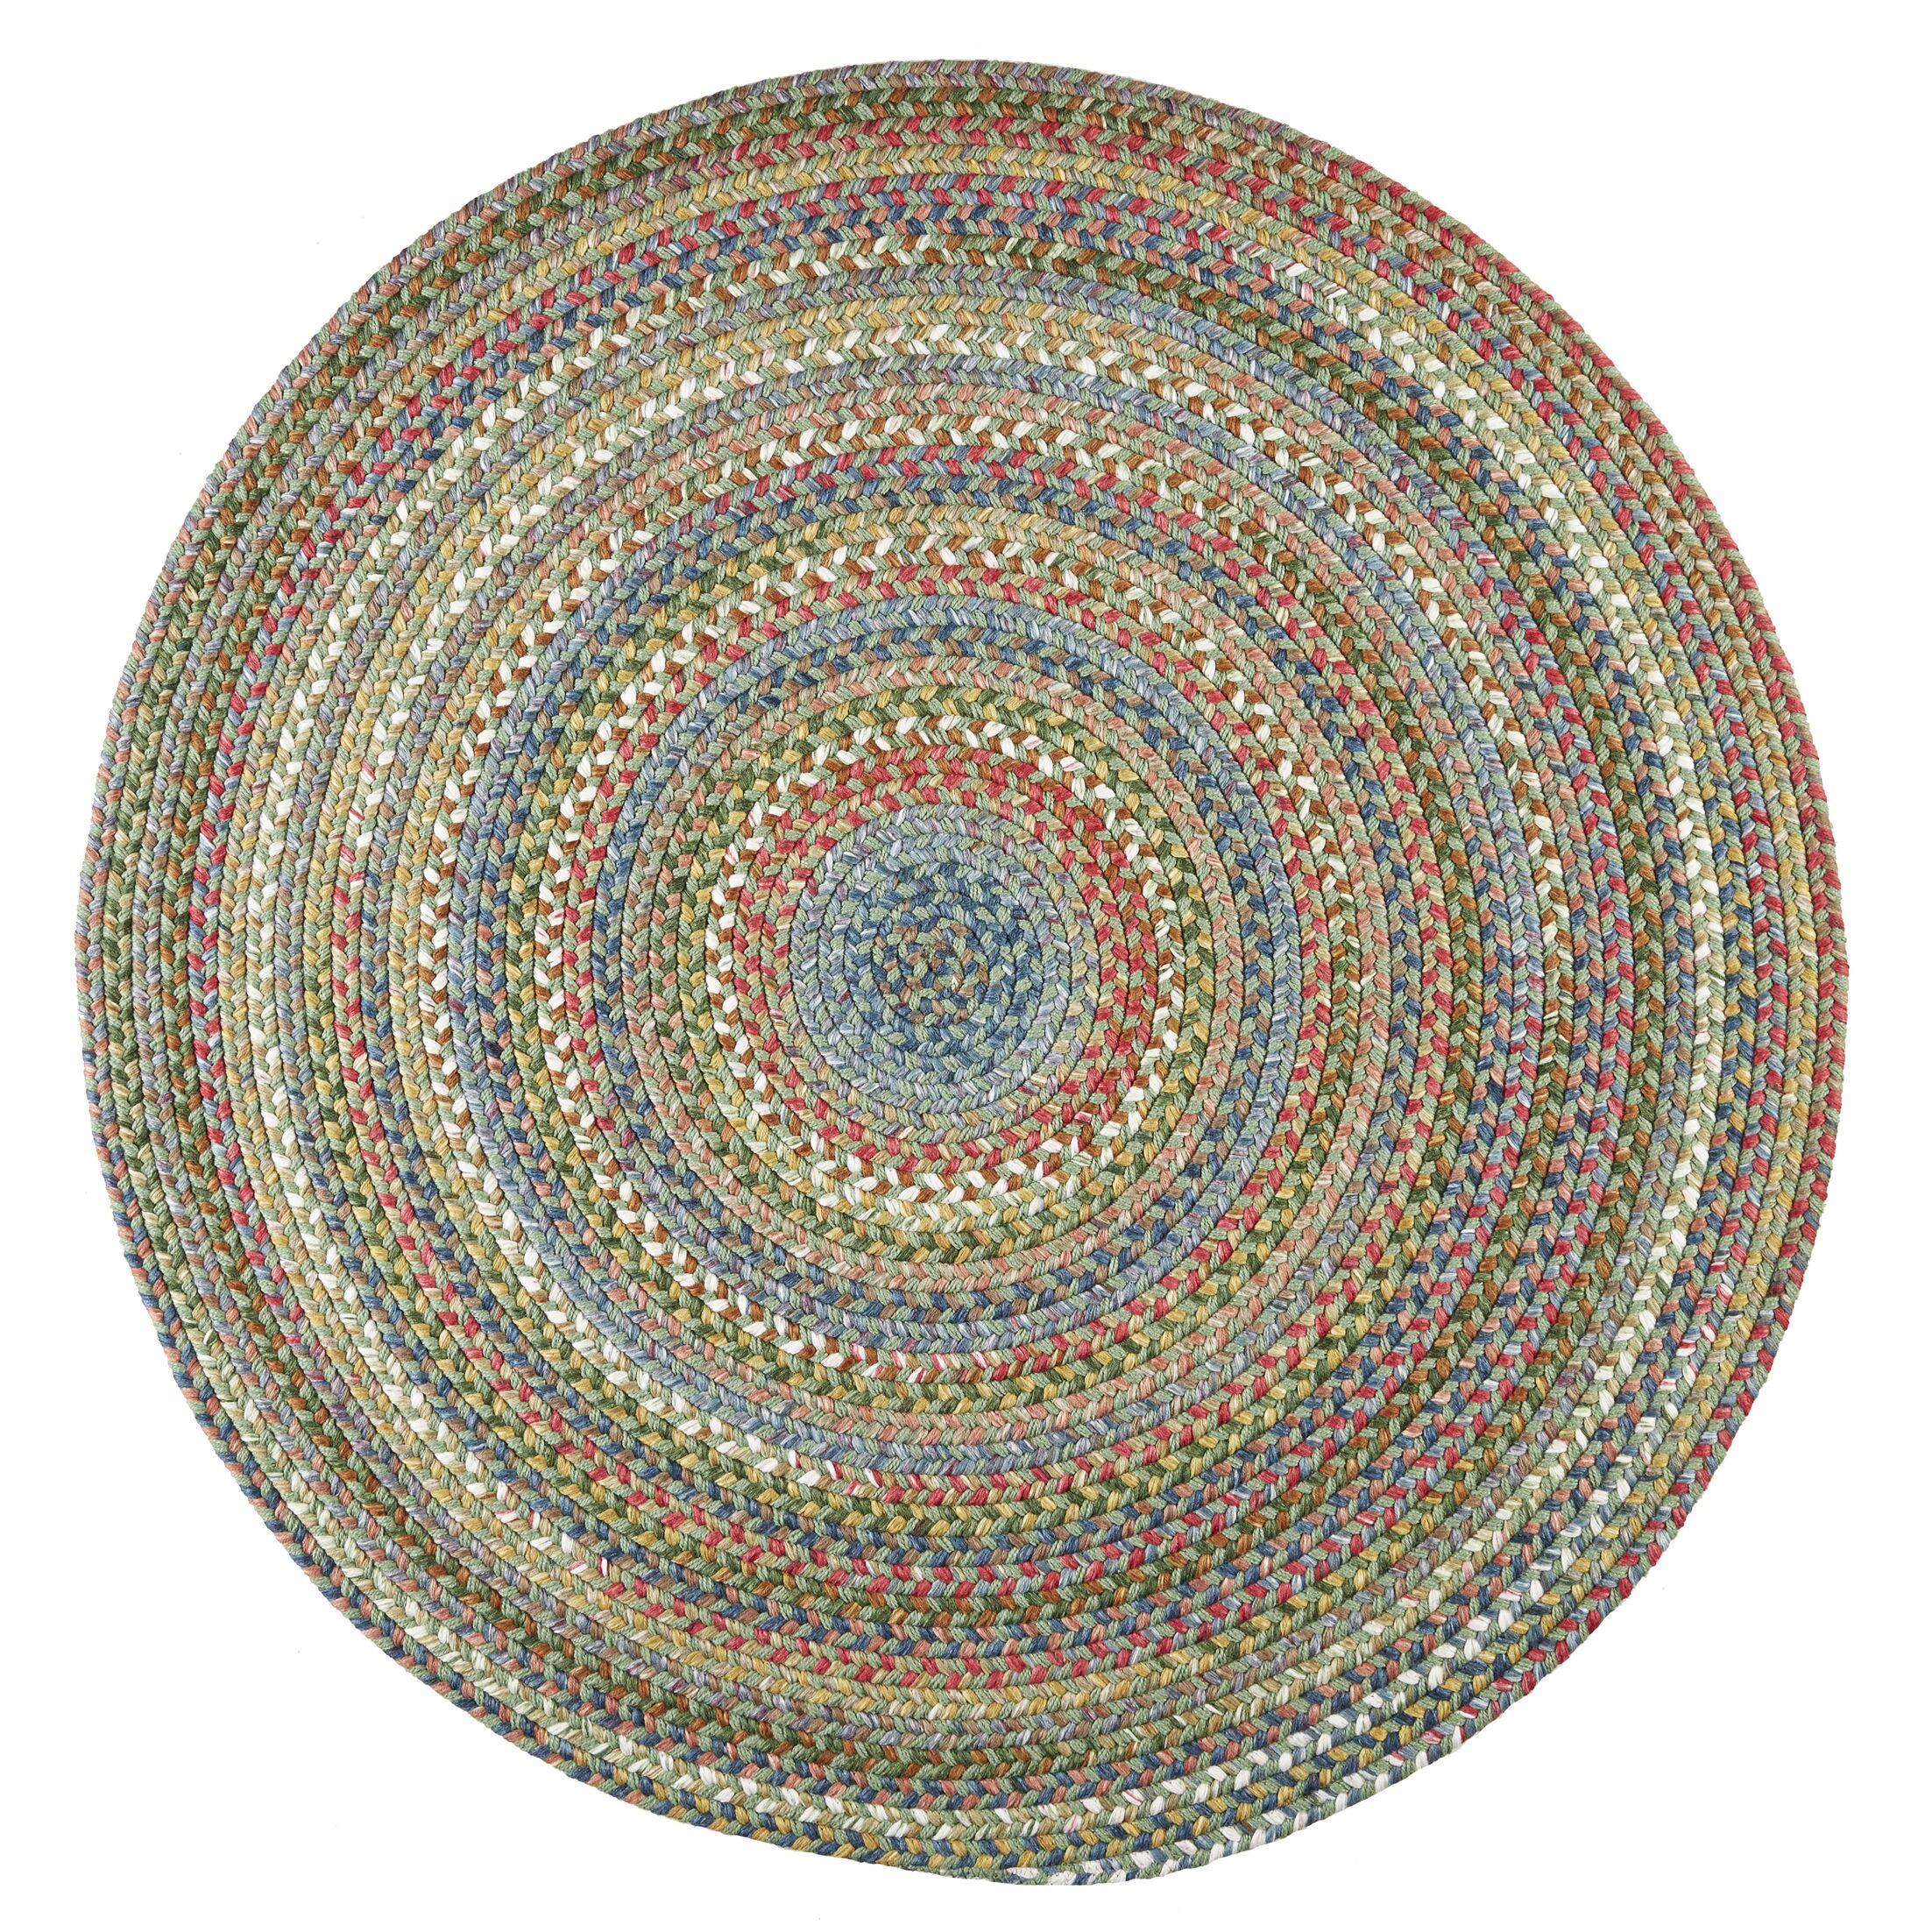 Handmade Peridot Indoor/Outdoor Area Rug Rug Size: Round 10'